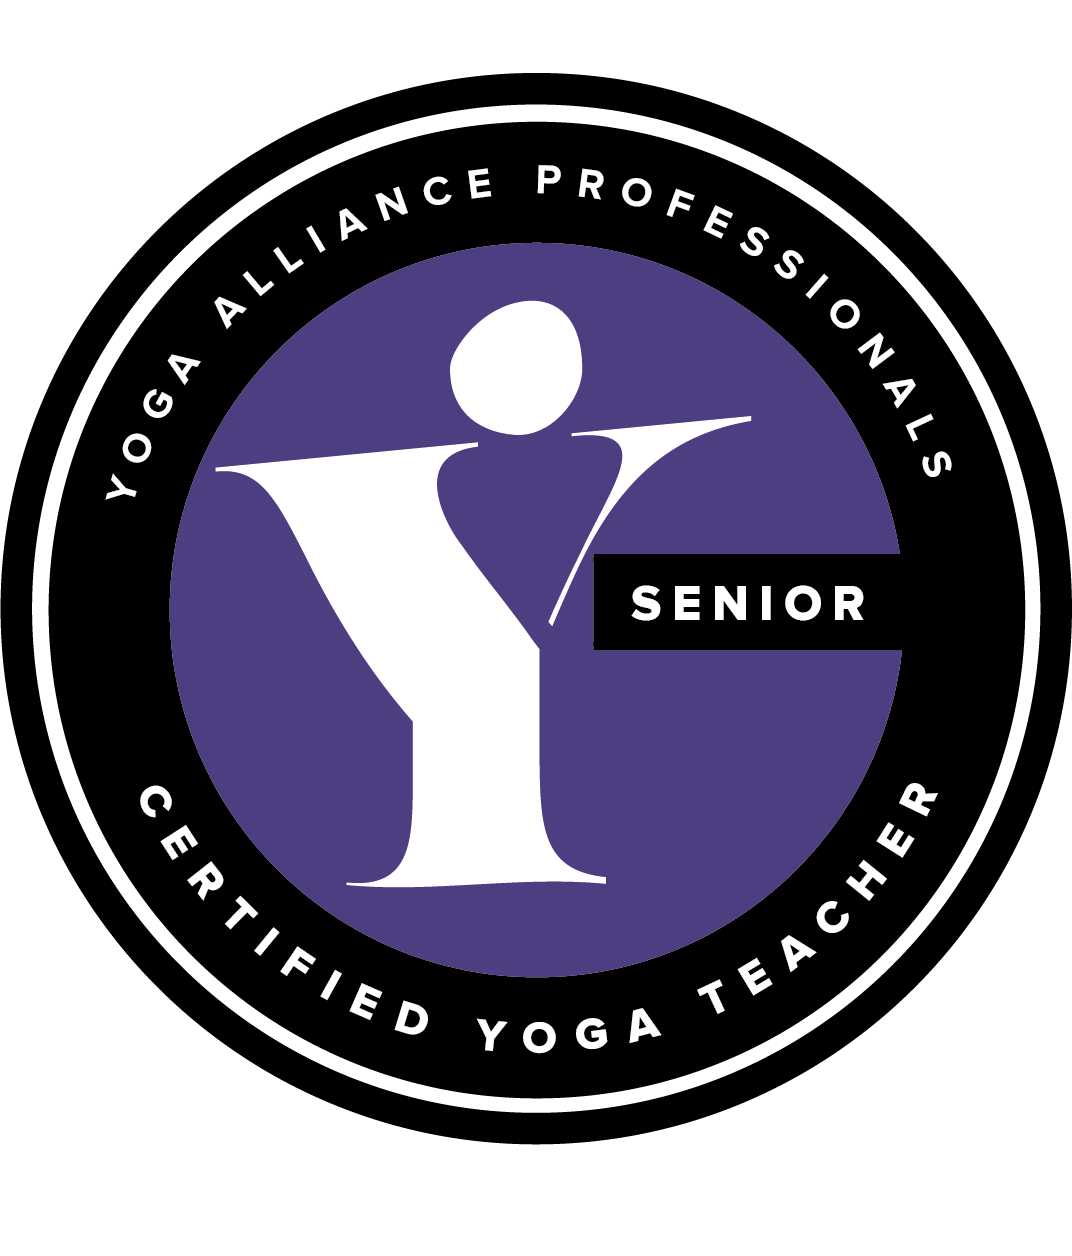 ANDREA BEOM - yoga teacher mentor consultant - insegnante mentore consulente - yoga alliance professional